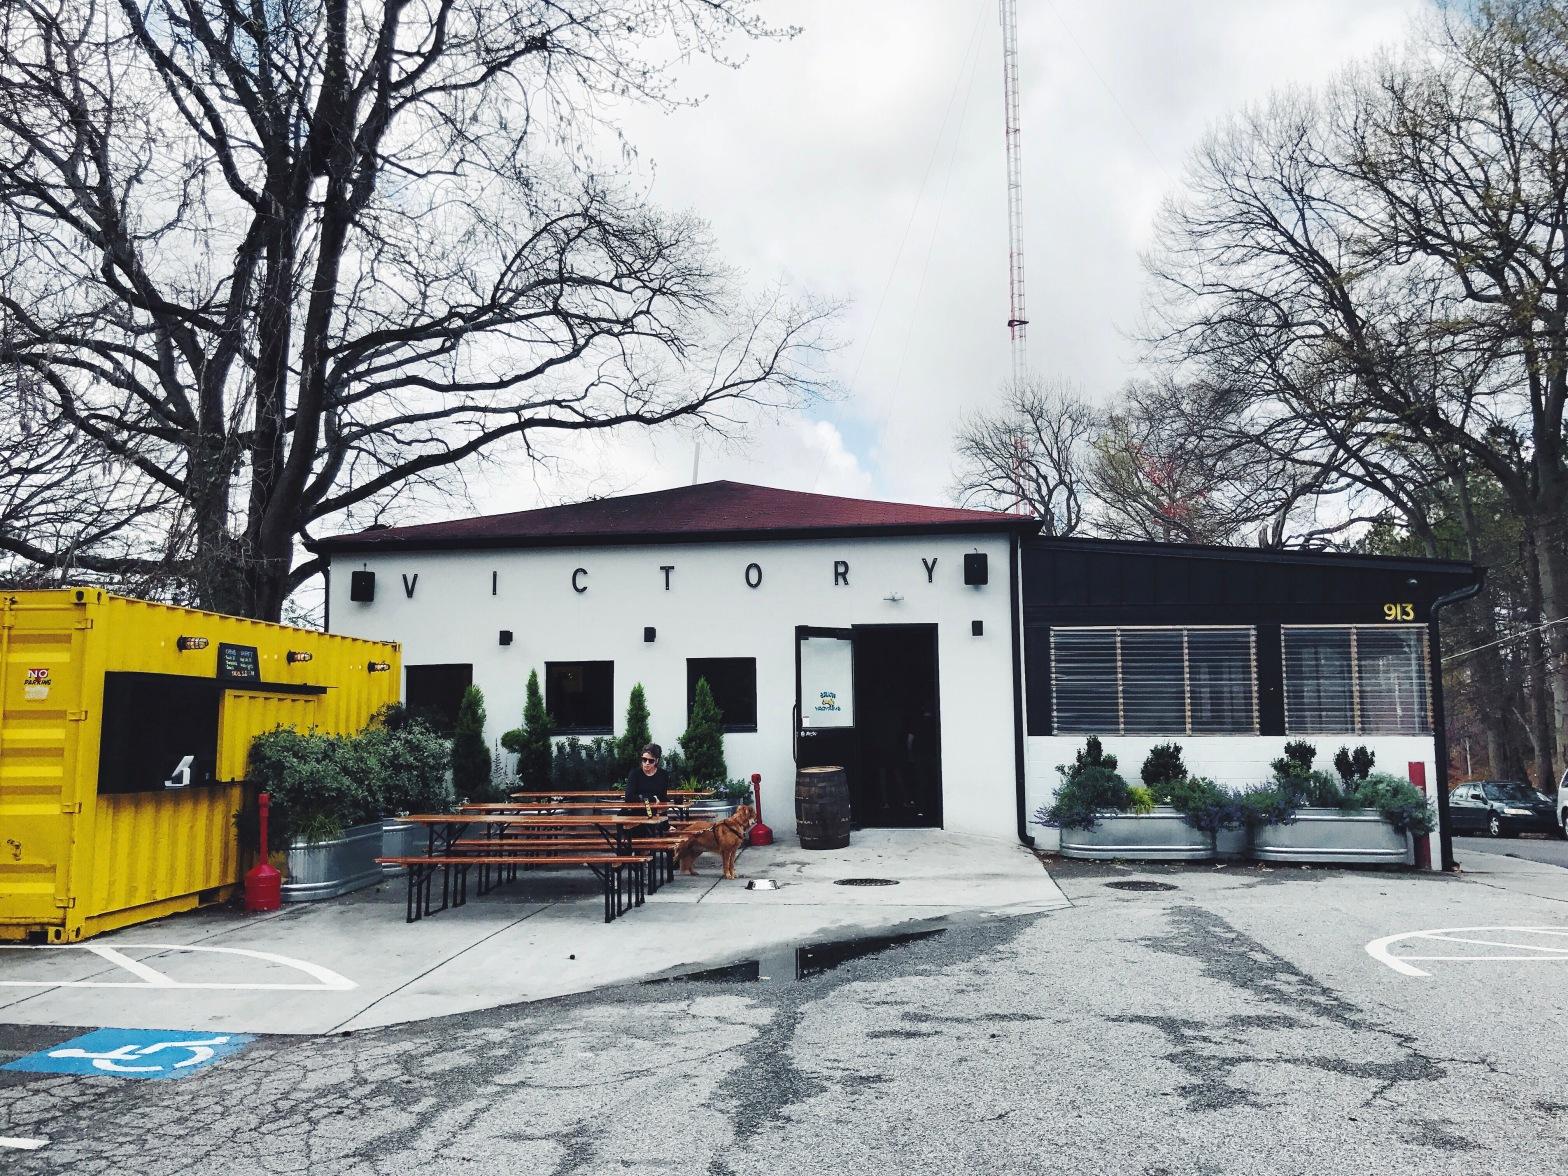 Victory sandwich bar in Inman Park, Atlanta GA